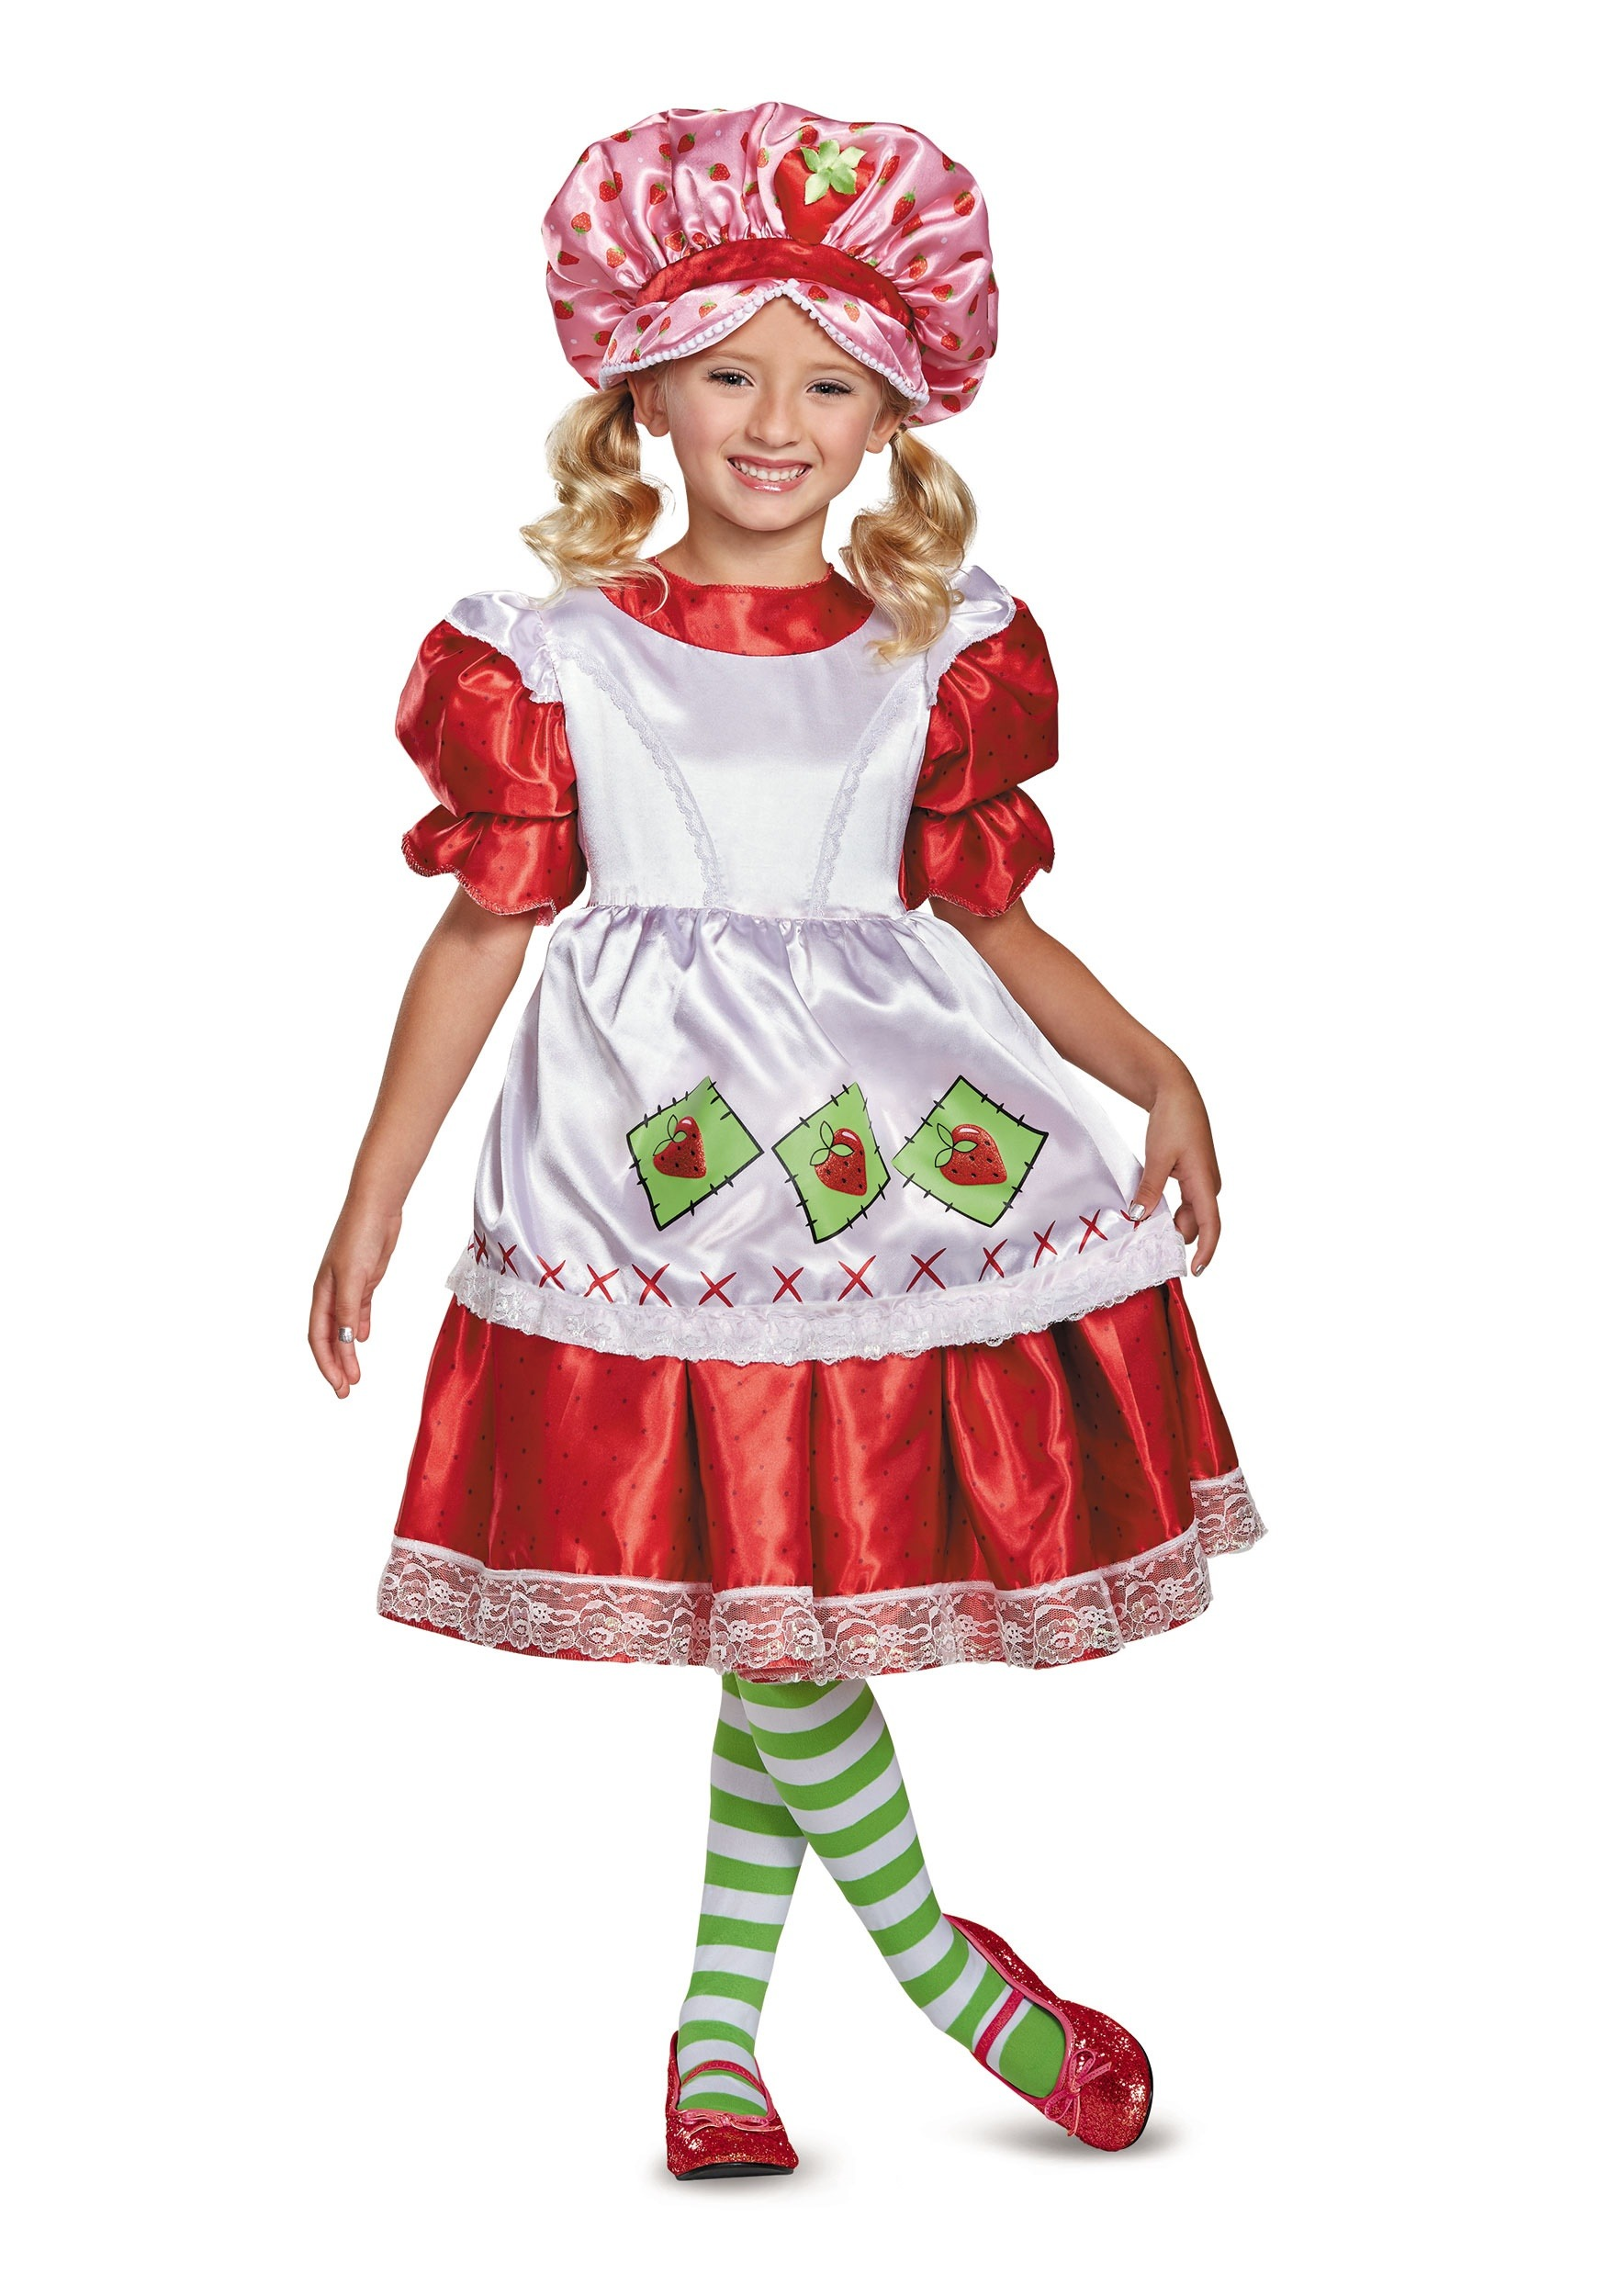 Strawberry Shortcake Costumes